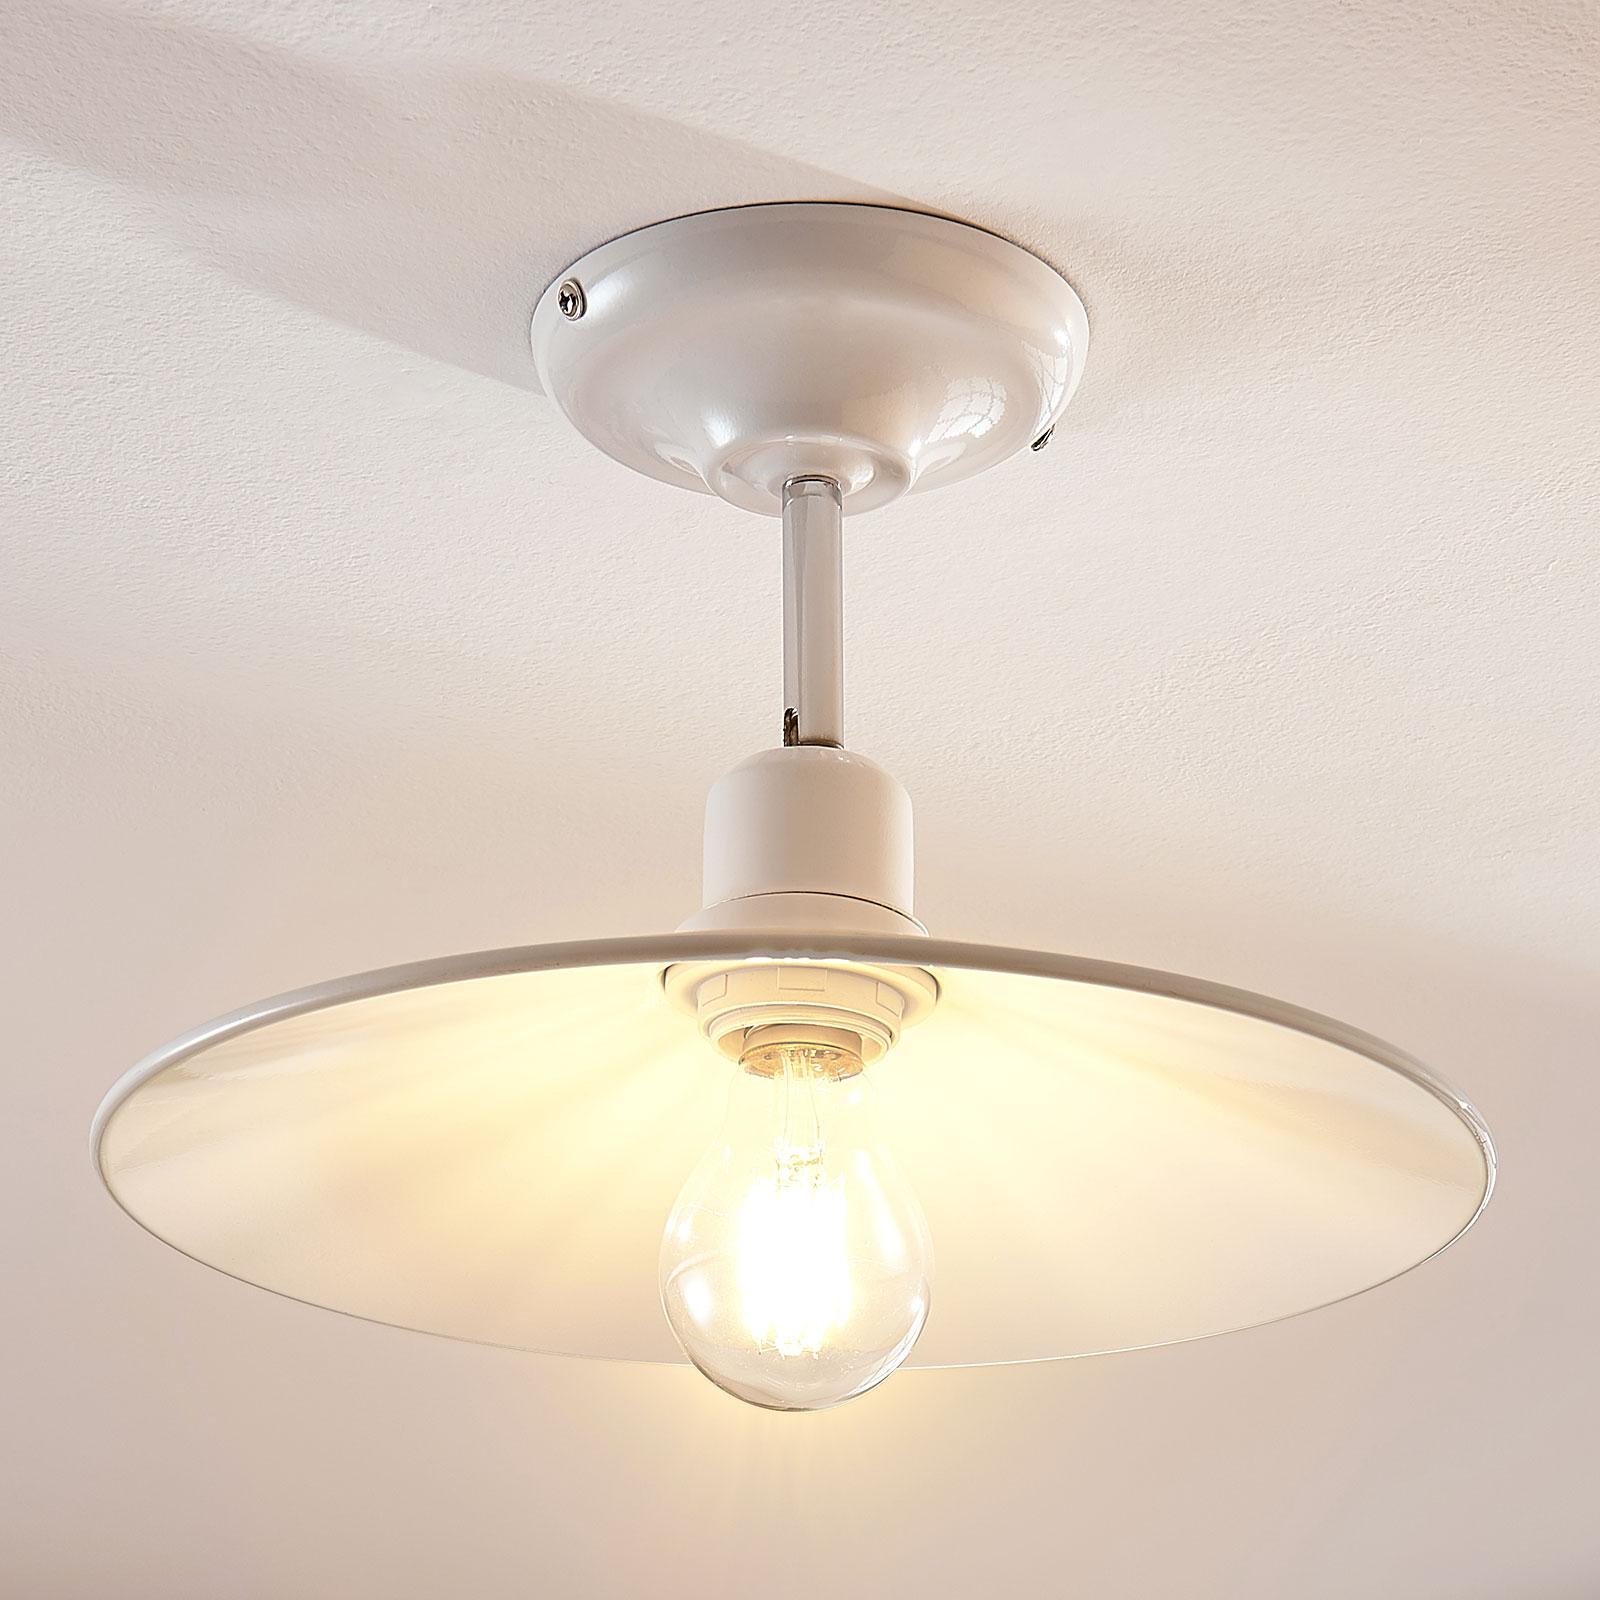 Biała metalowa lampa sufitowa Phinea, vintage